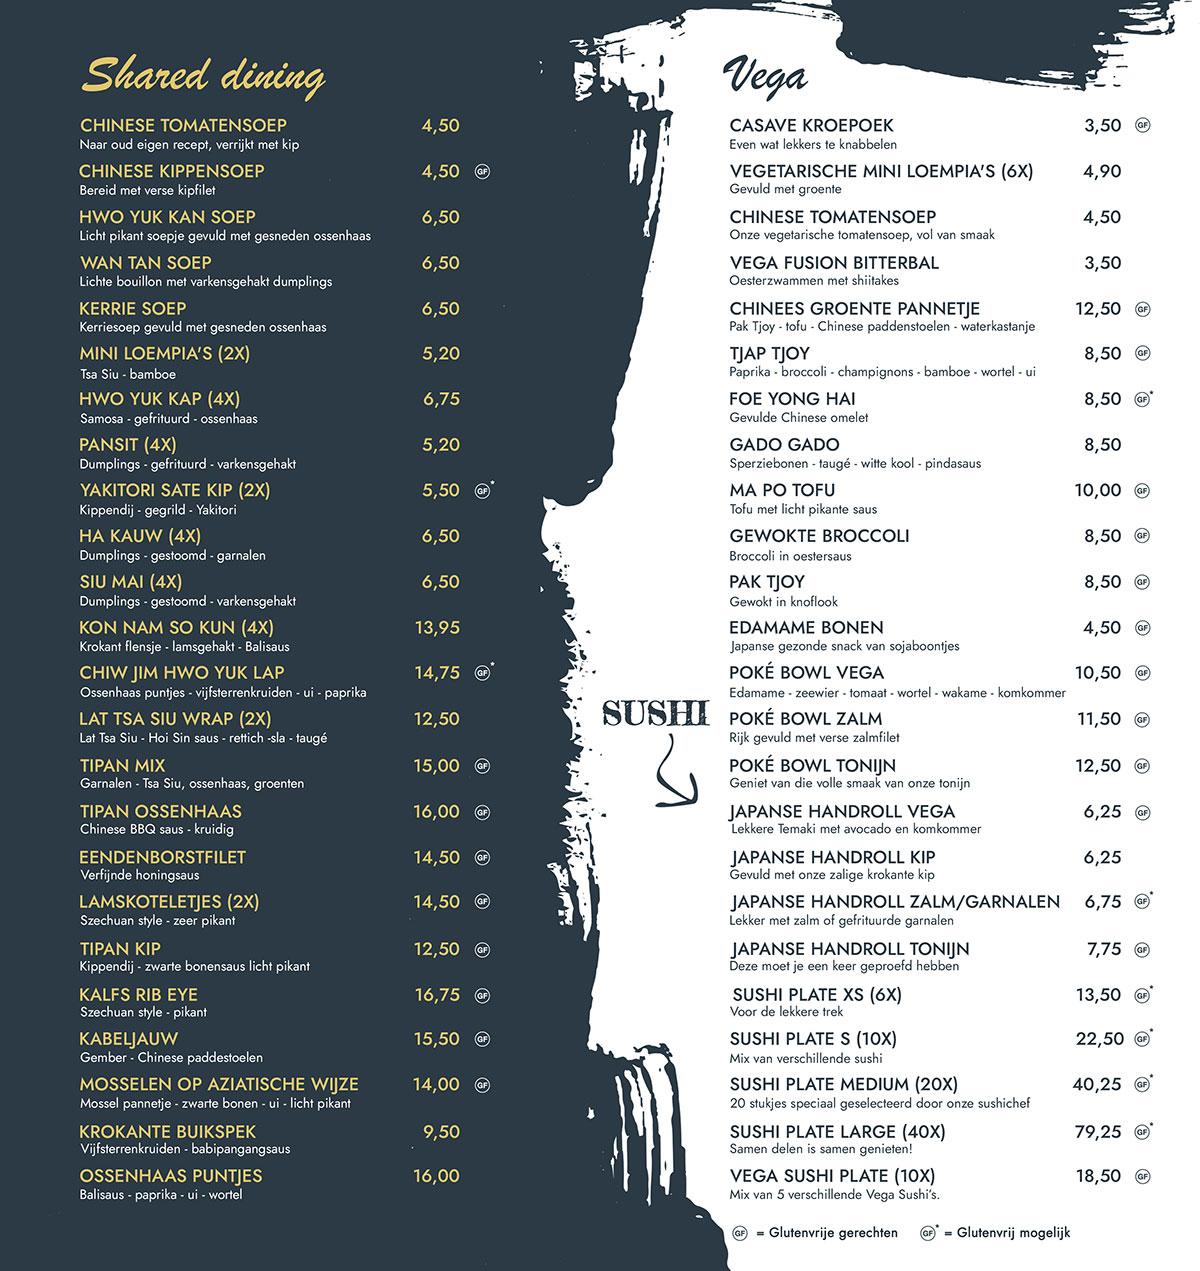 Shared Dining menu